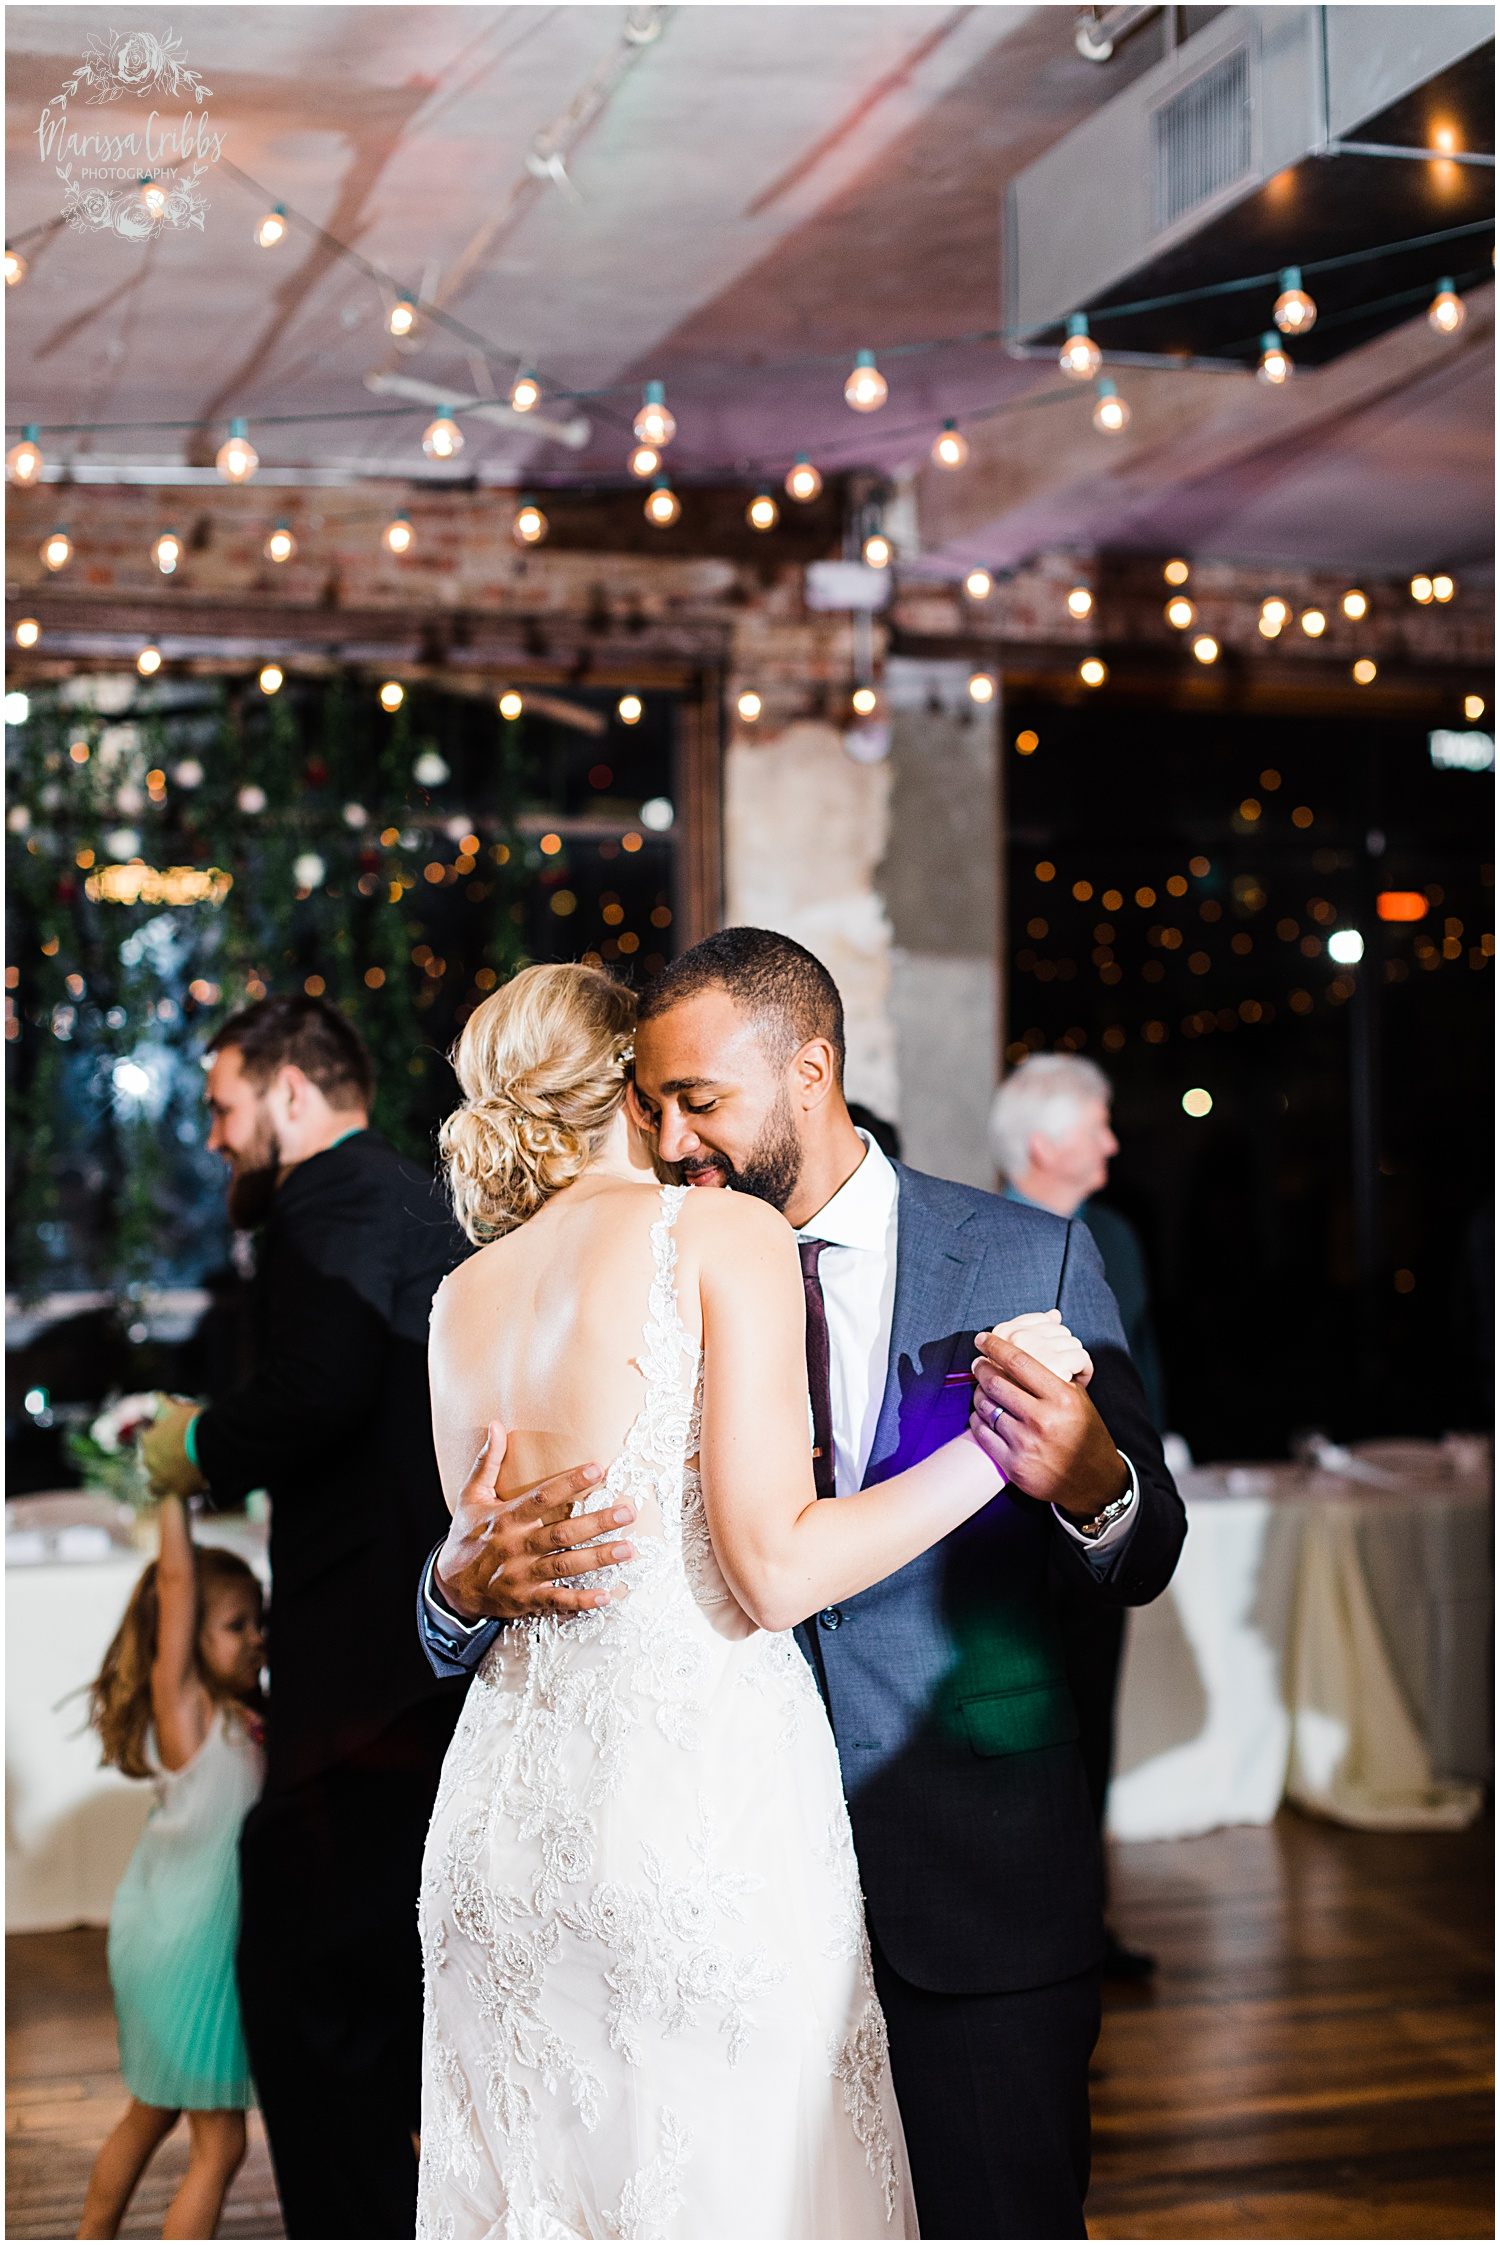 BAUER WEDDING   KELSEA & JUSTIN   MARISSA CRIBBS PHOTOGRAPHY_6609.jpg